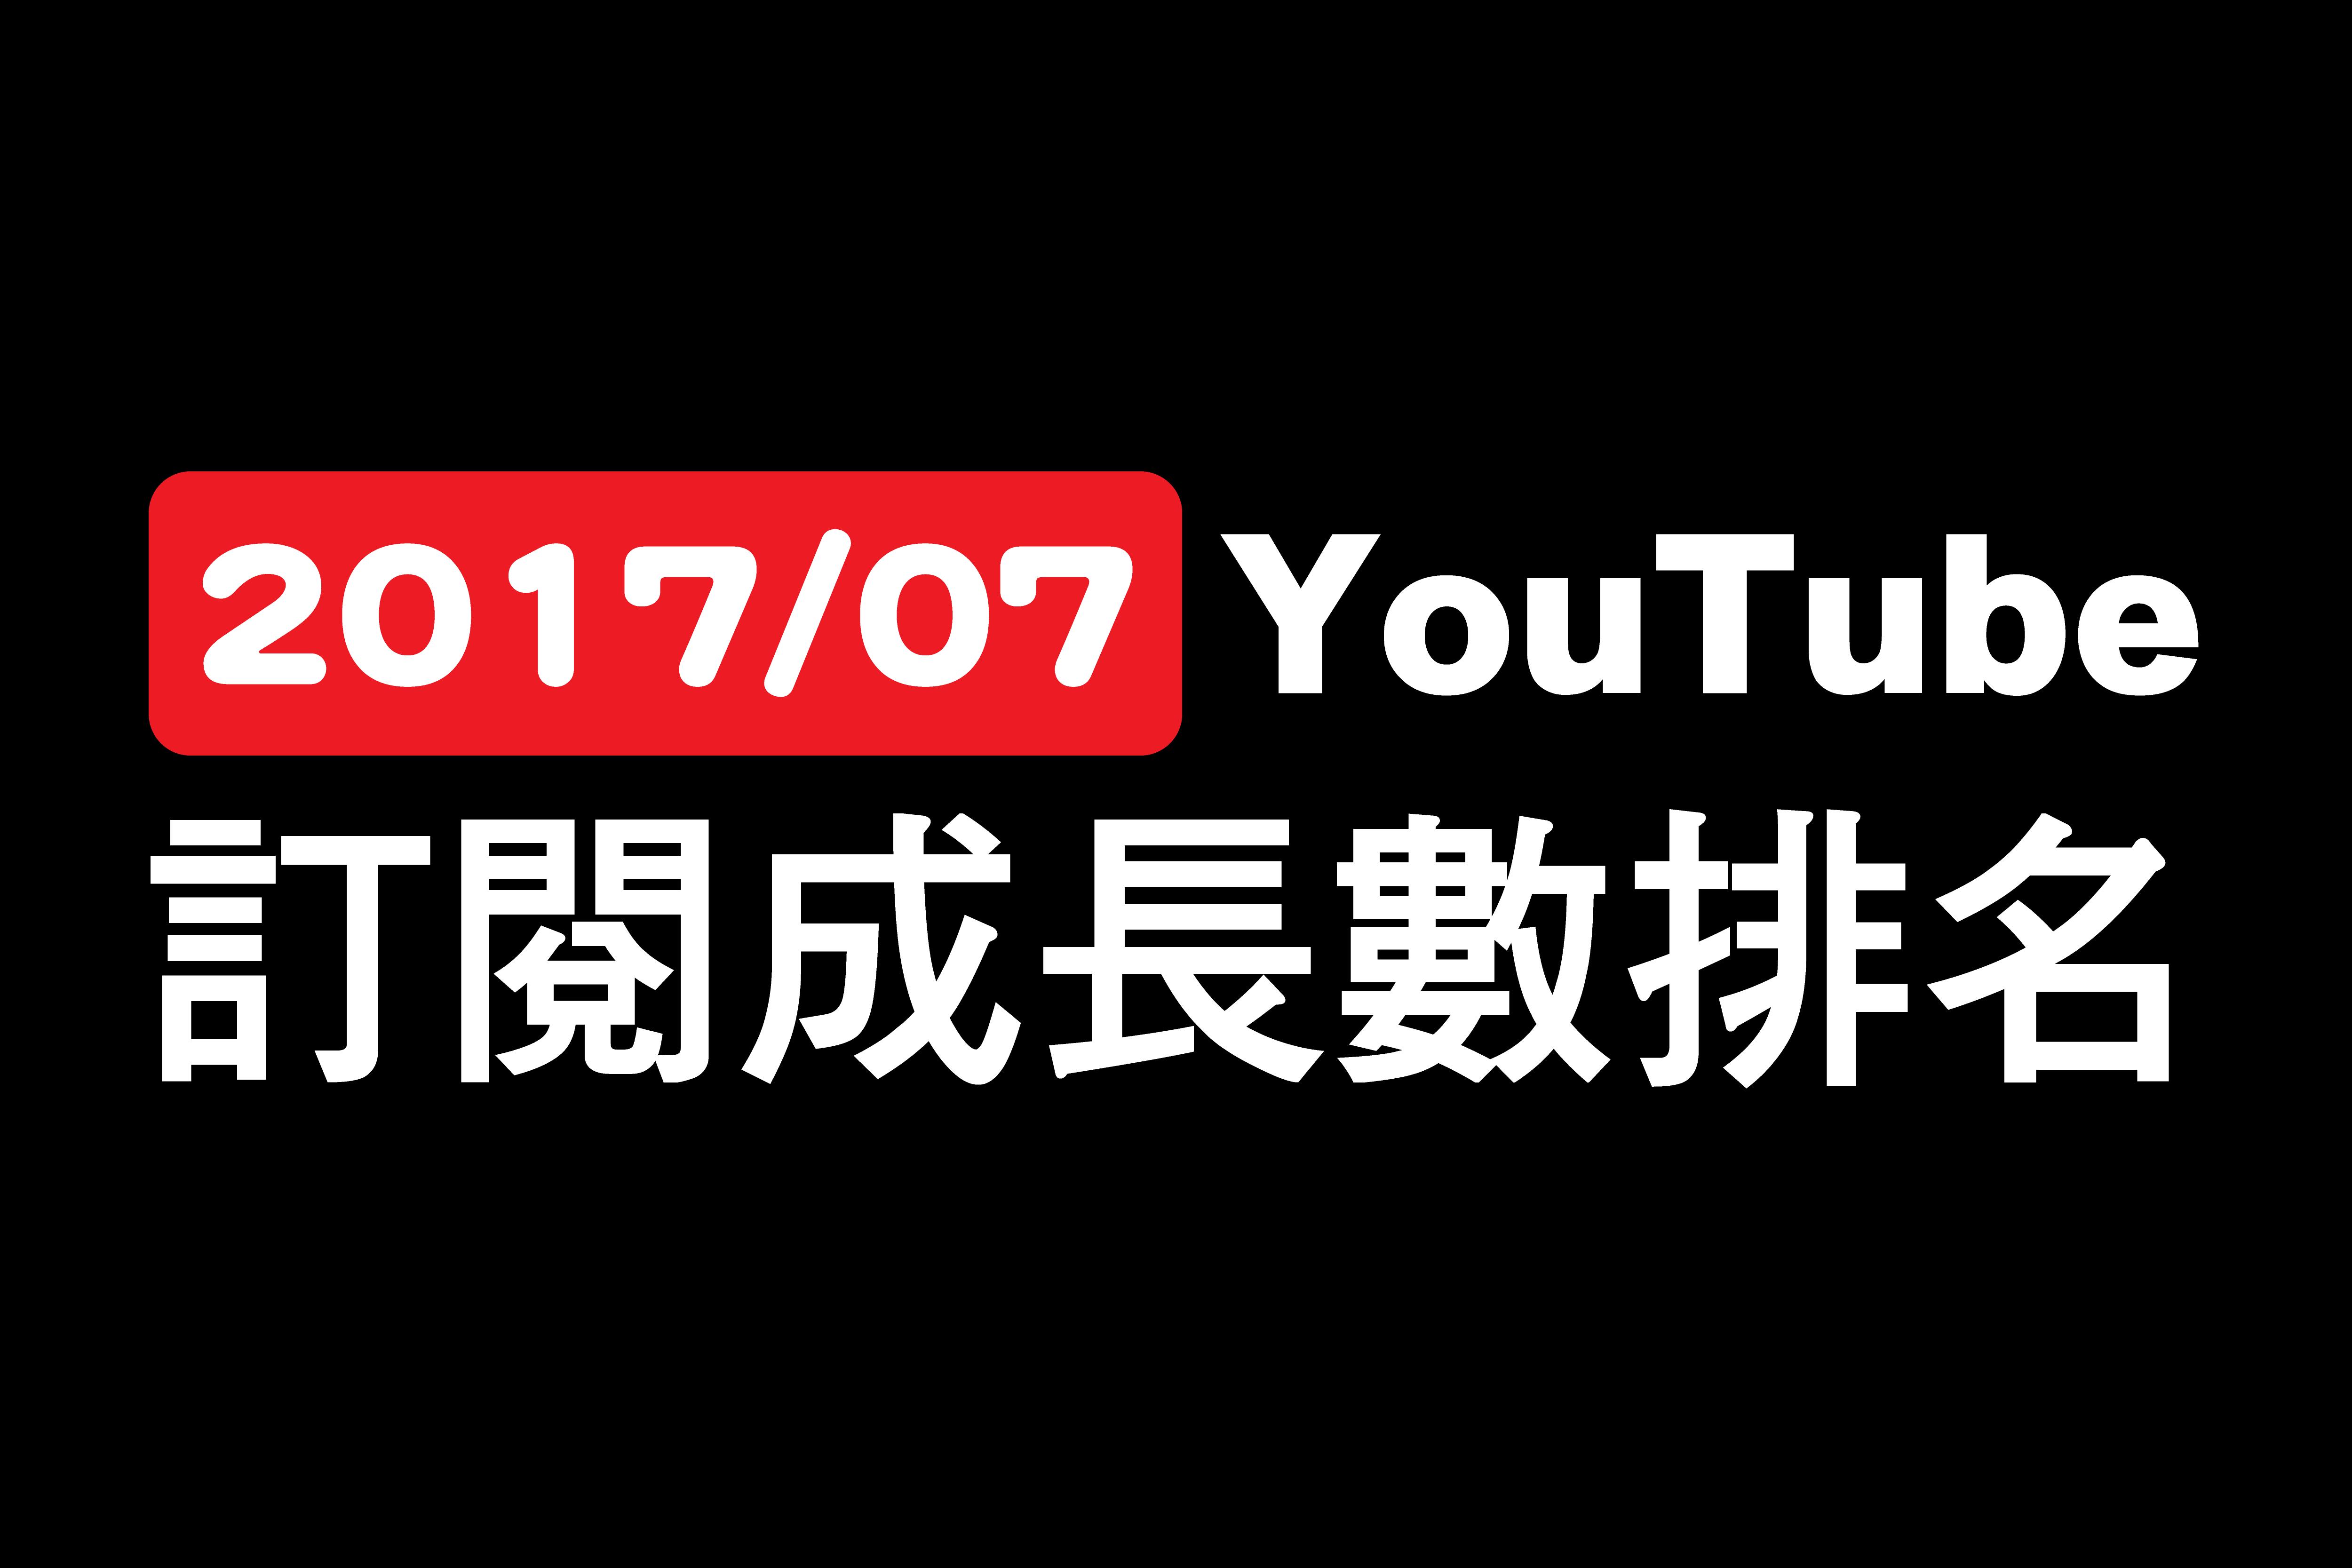 InteRed - YouTube頻道七月份訂閱數排名